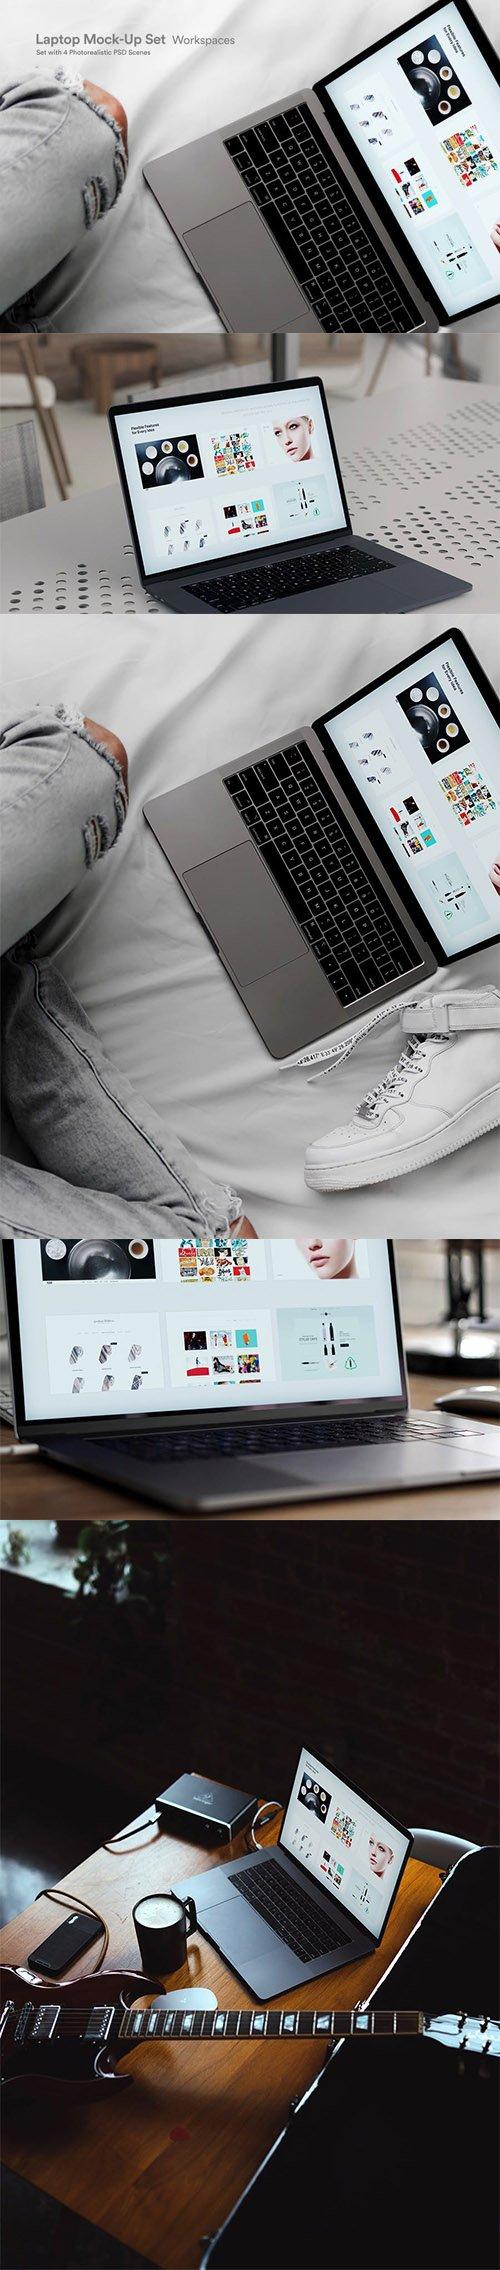 Laptop Touch-Bar Web UI Mock-Up - QVEMJN2